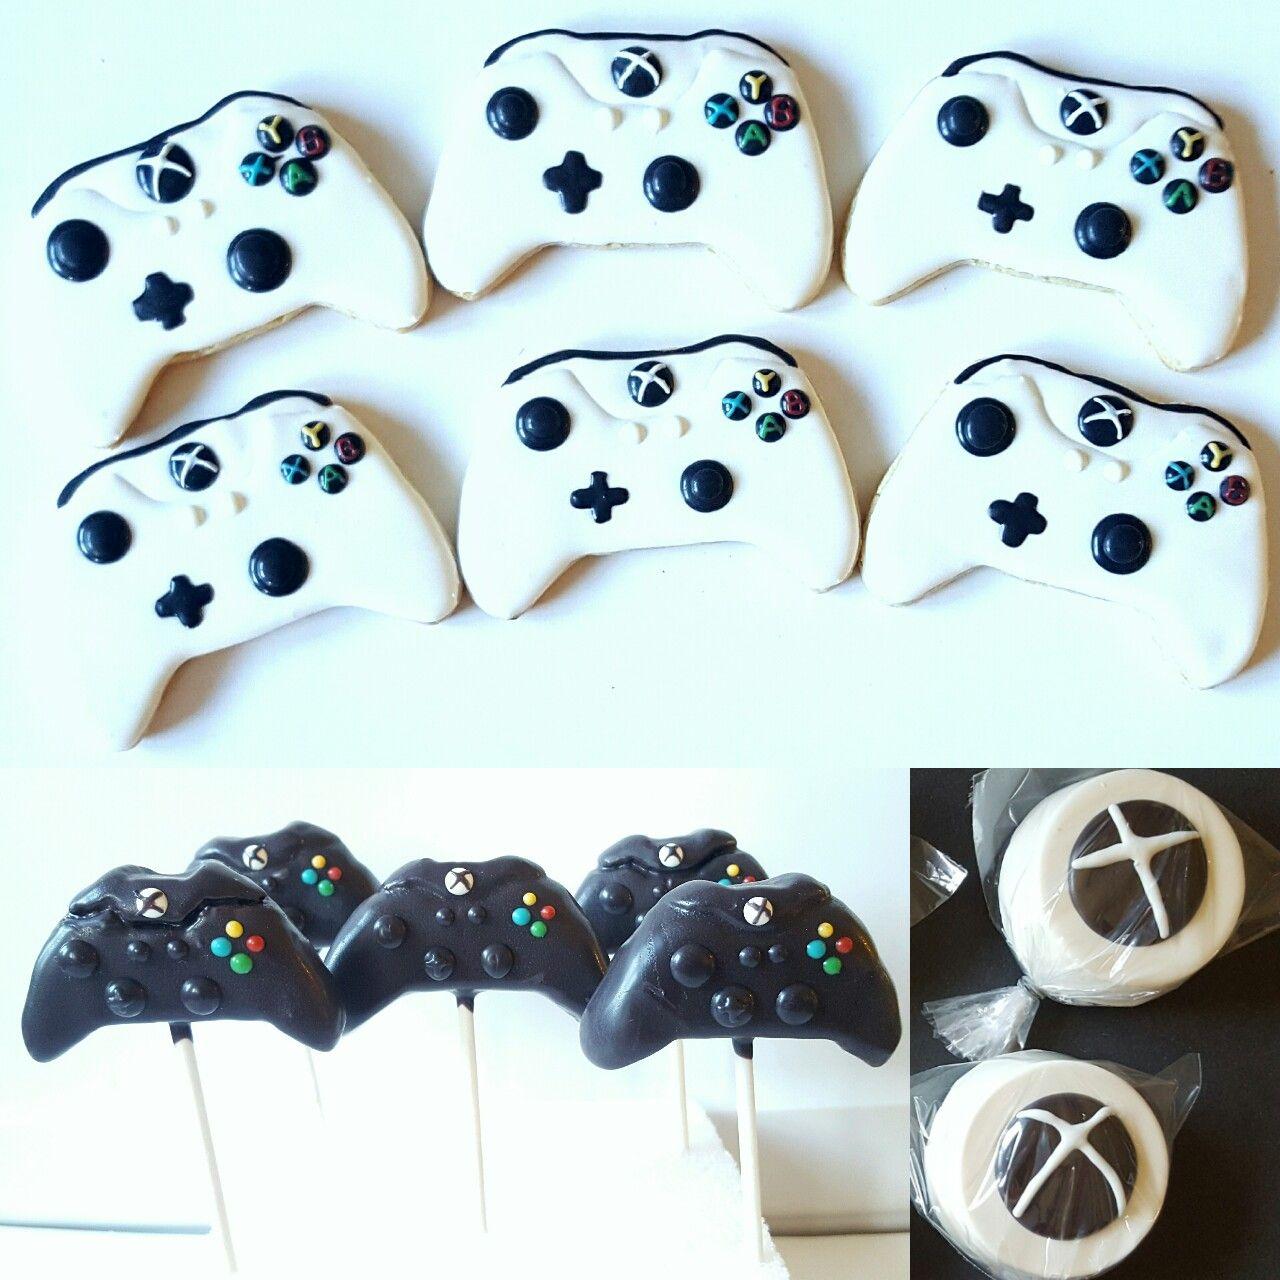 Xbox Theme Treats Xbox Controller Cookies Cake Pops Chocolate Dipped Oreo Chocolate Dipped Oreo Sugar Cookie